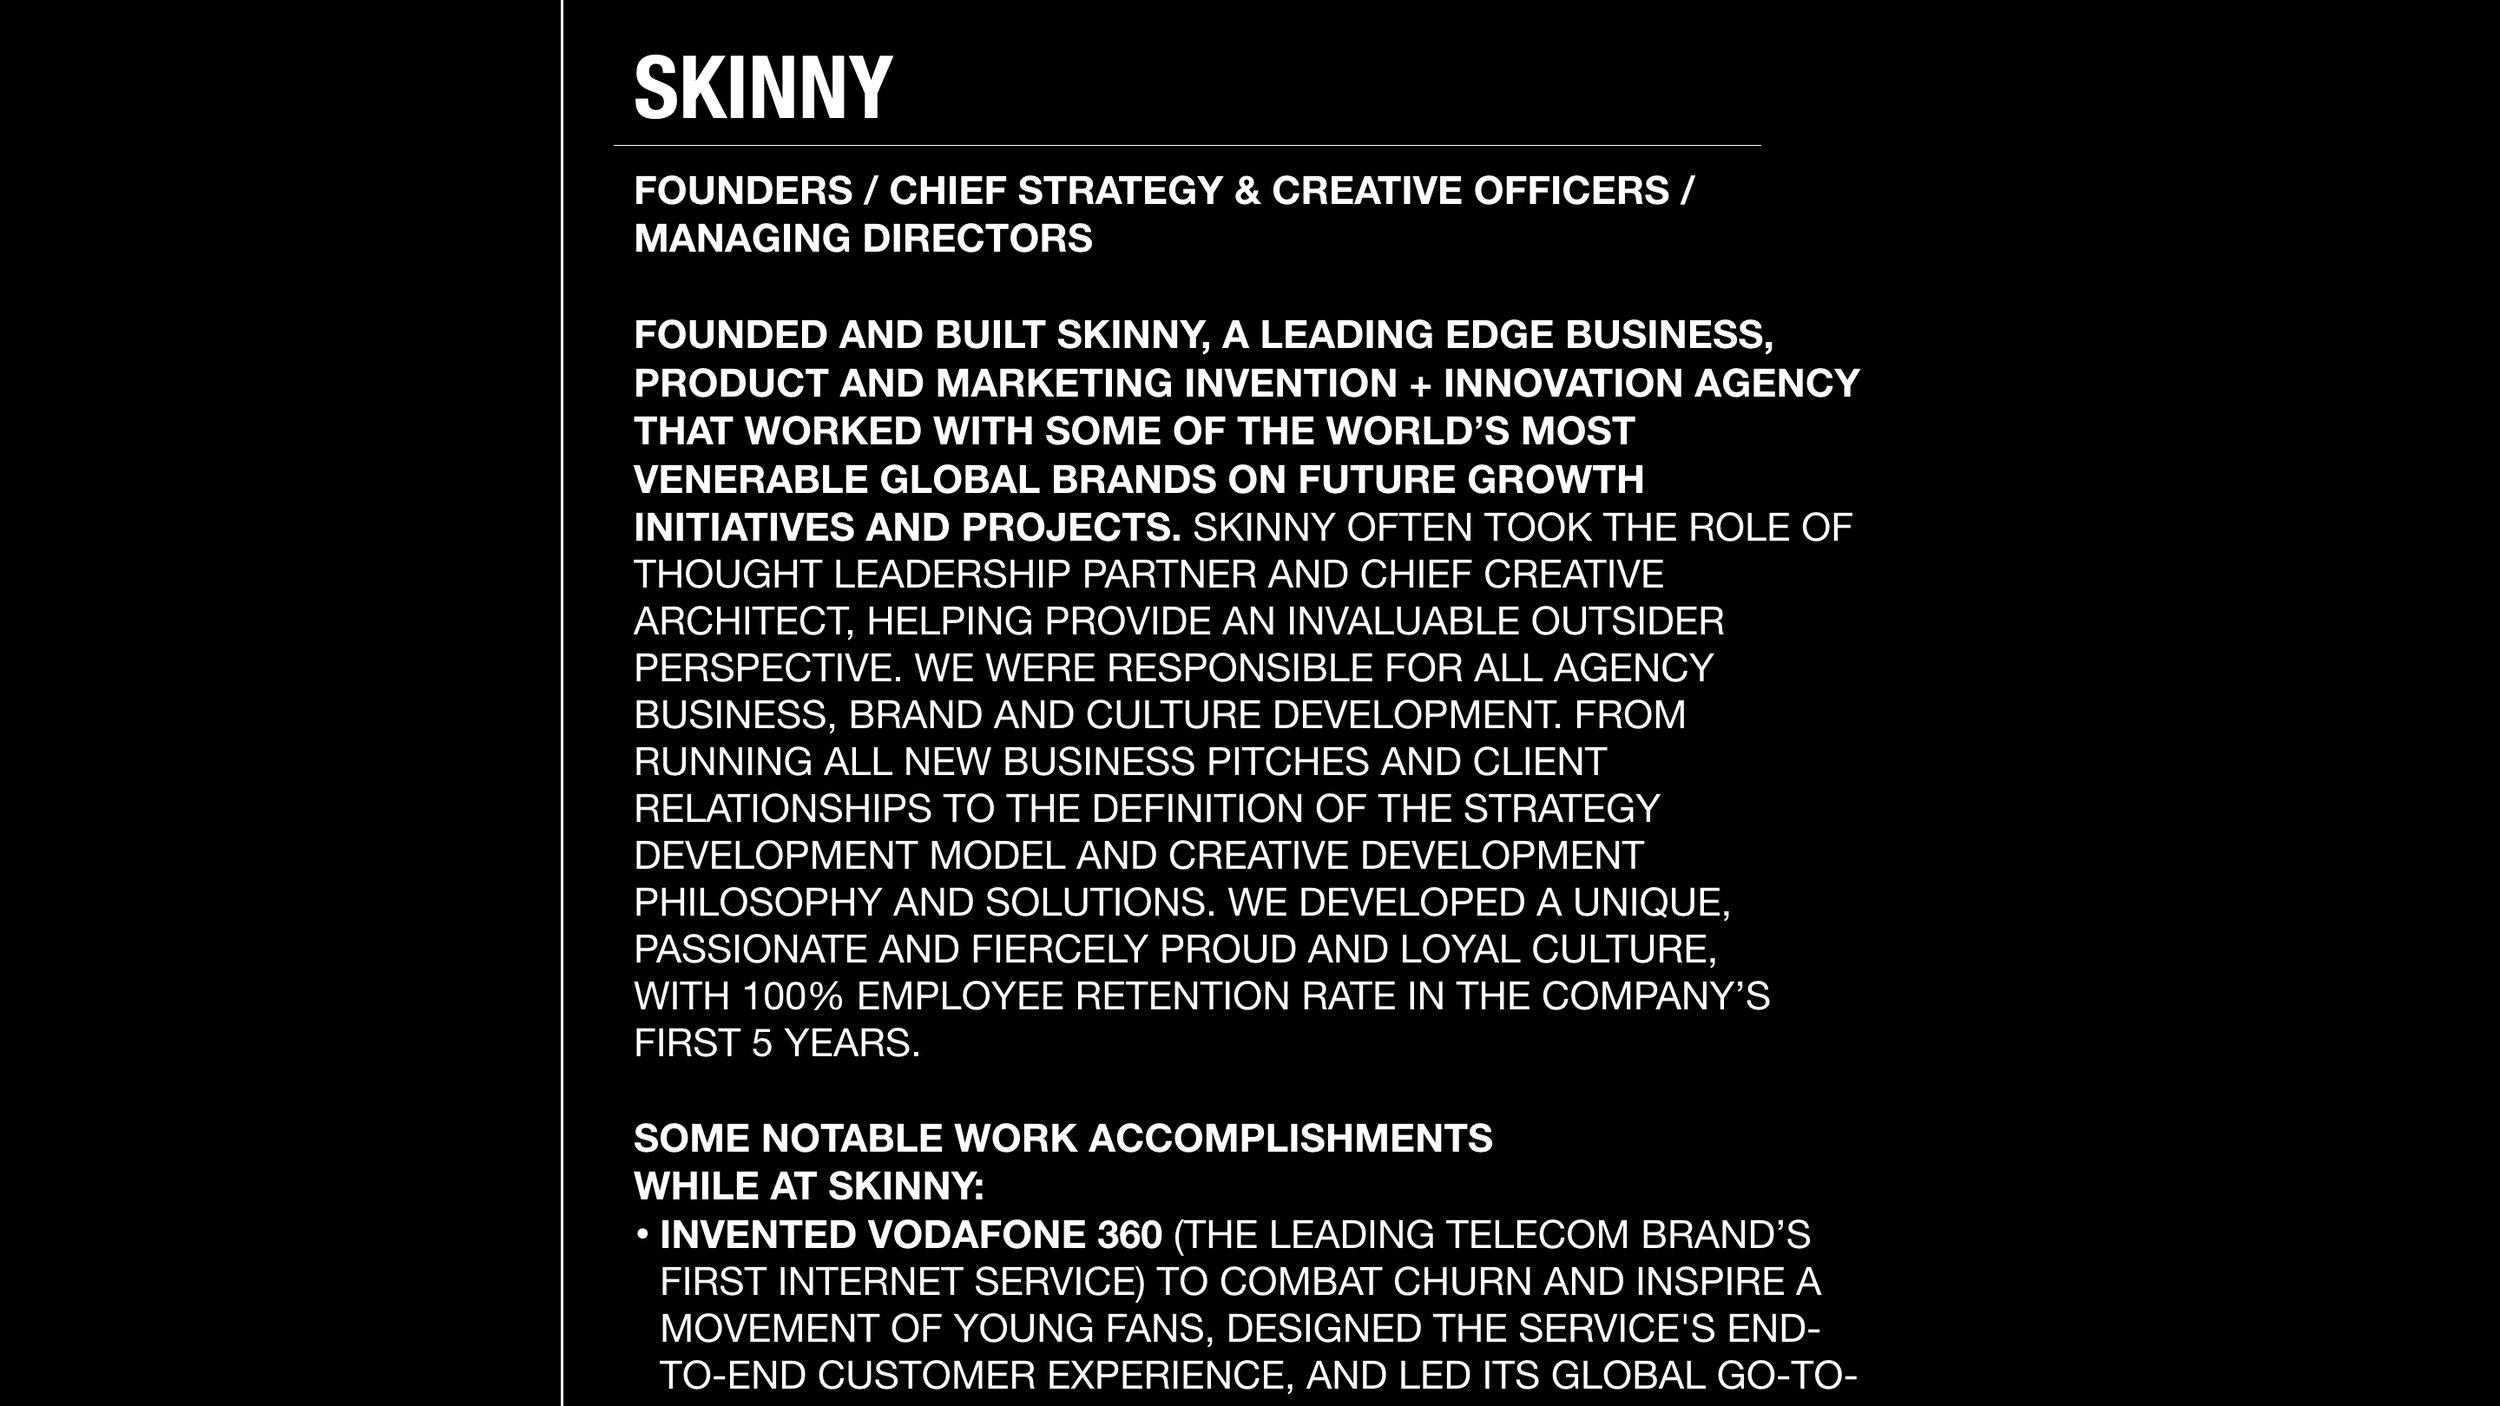 skinny_1.jpg